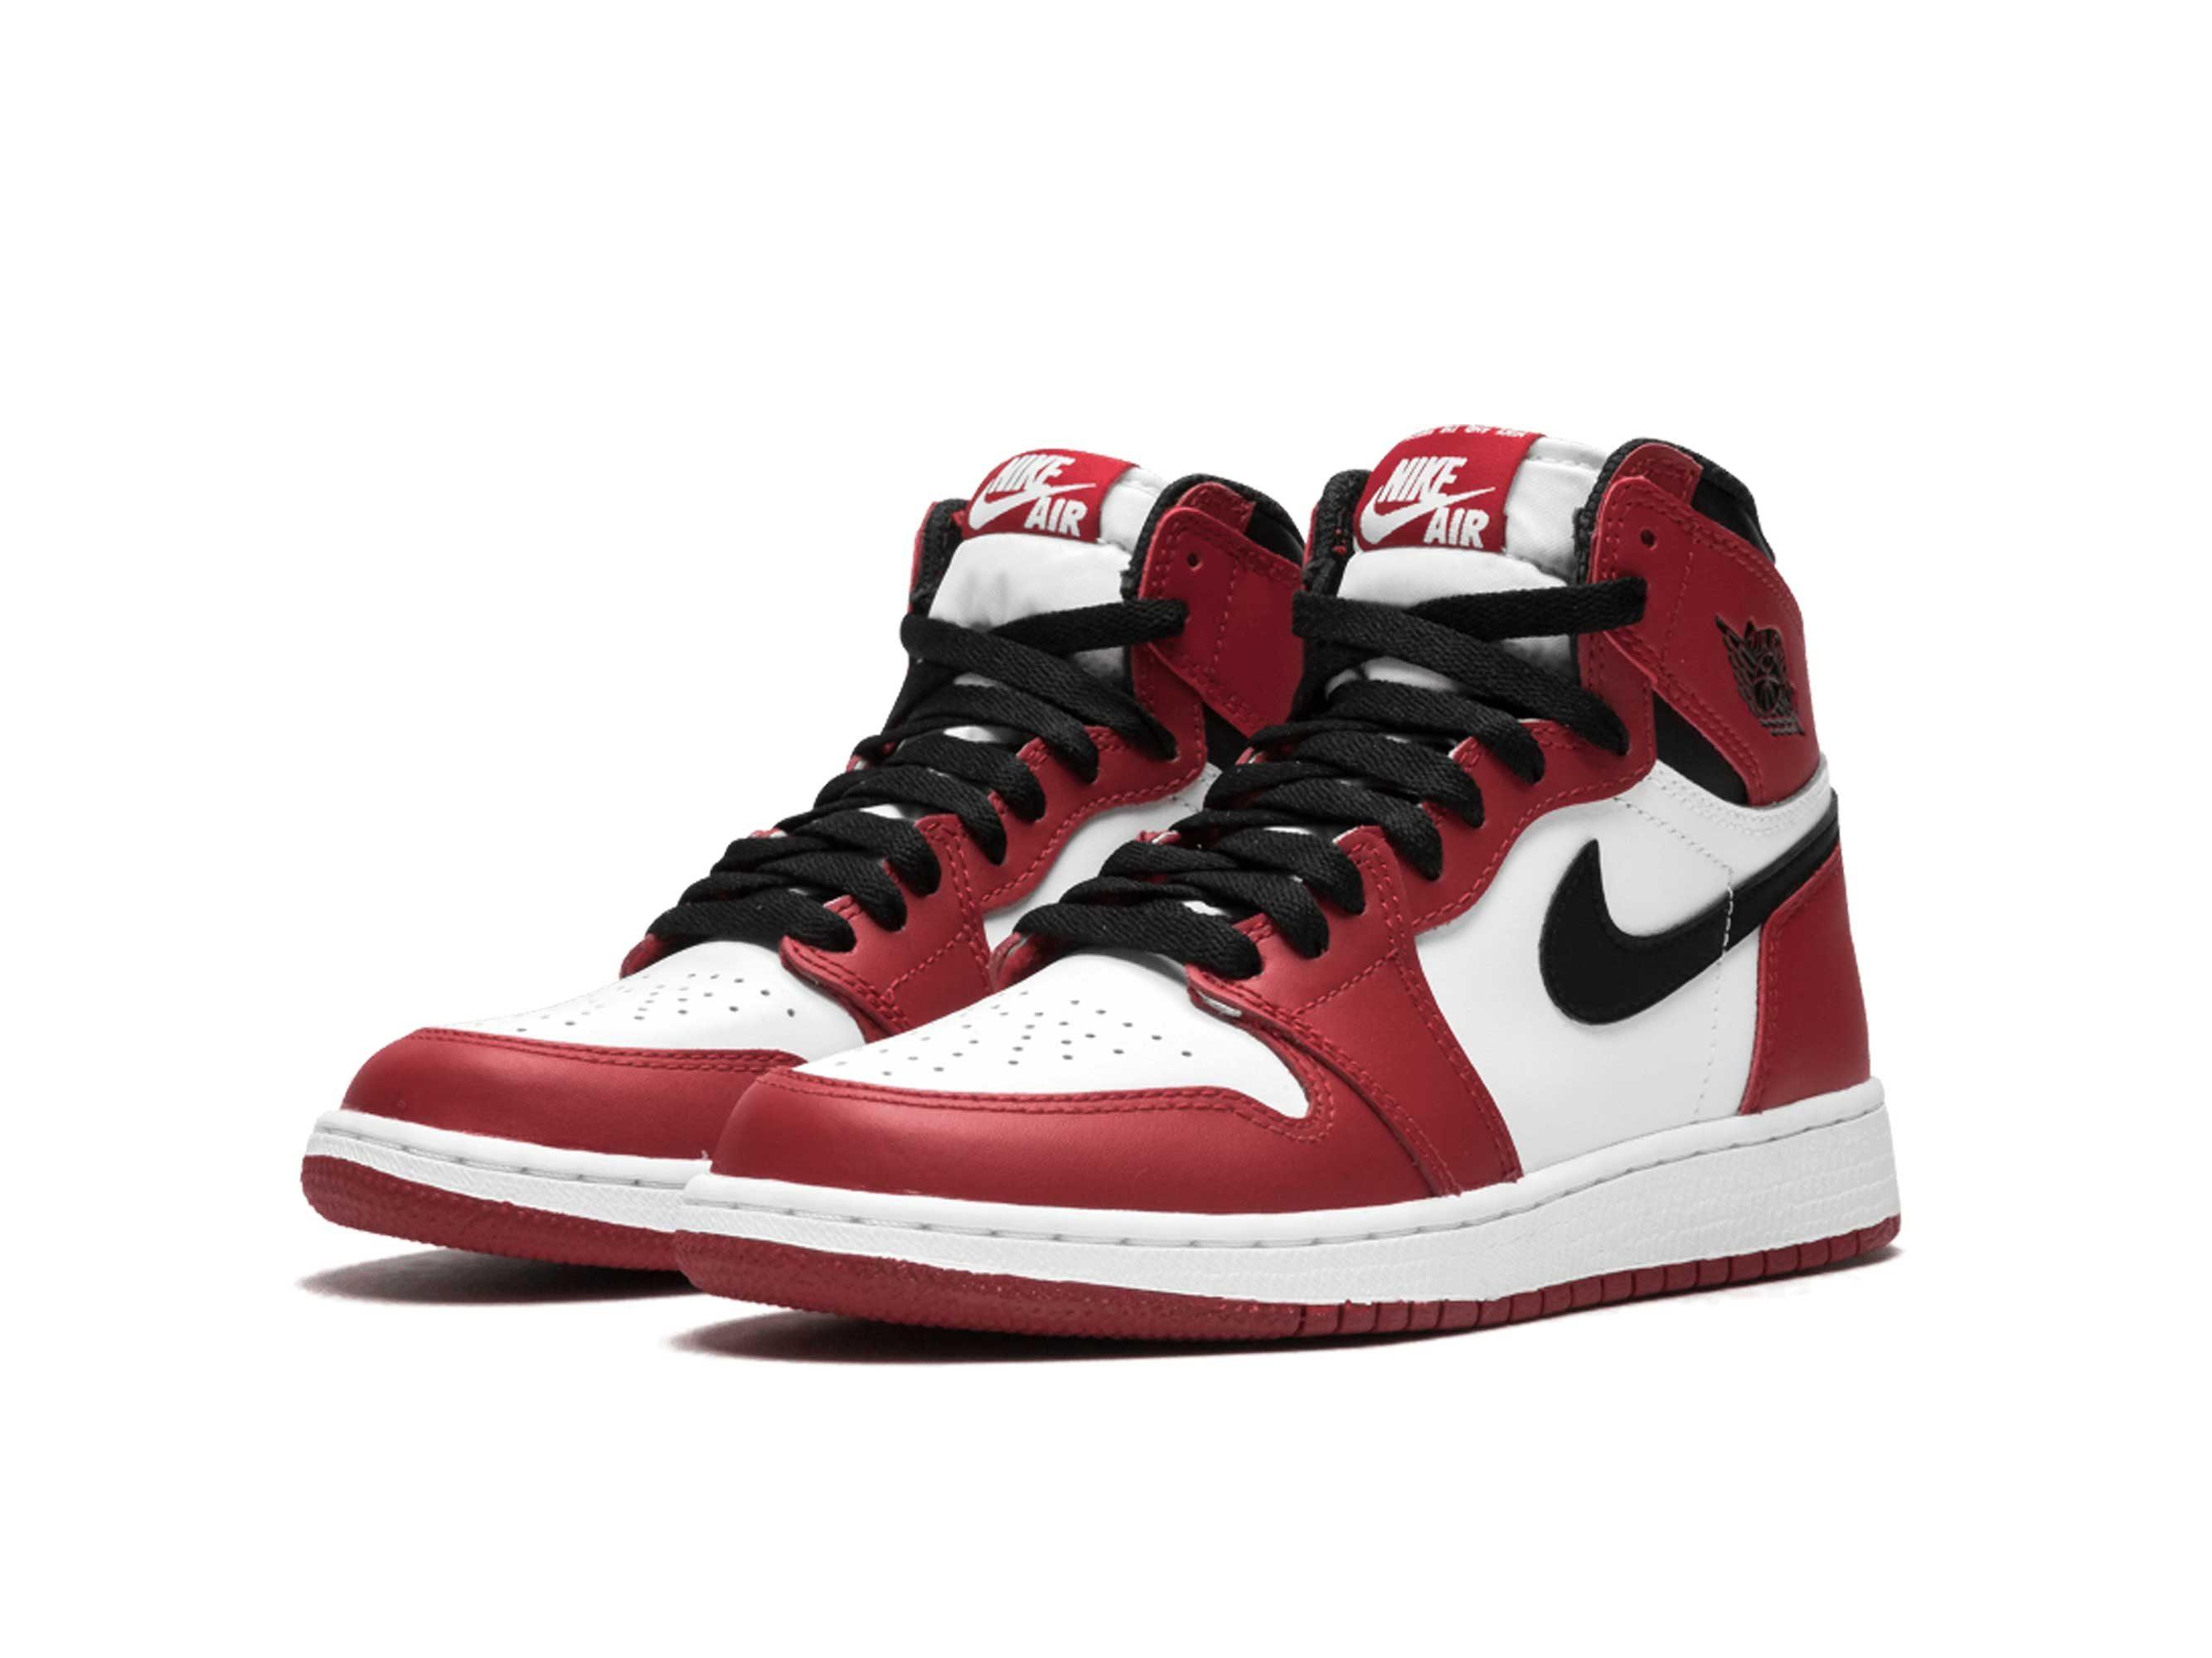 Jordan 1 retro high og red white 575441_101 купить